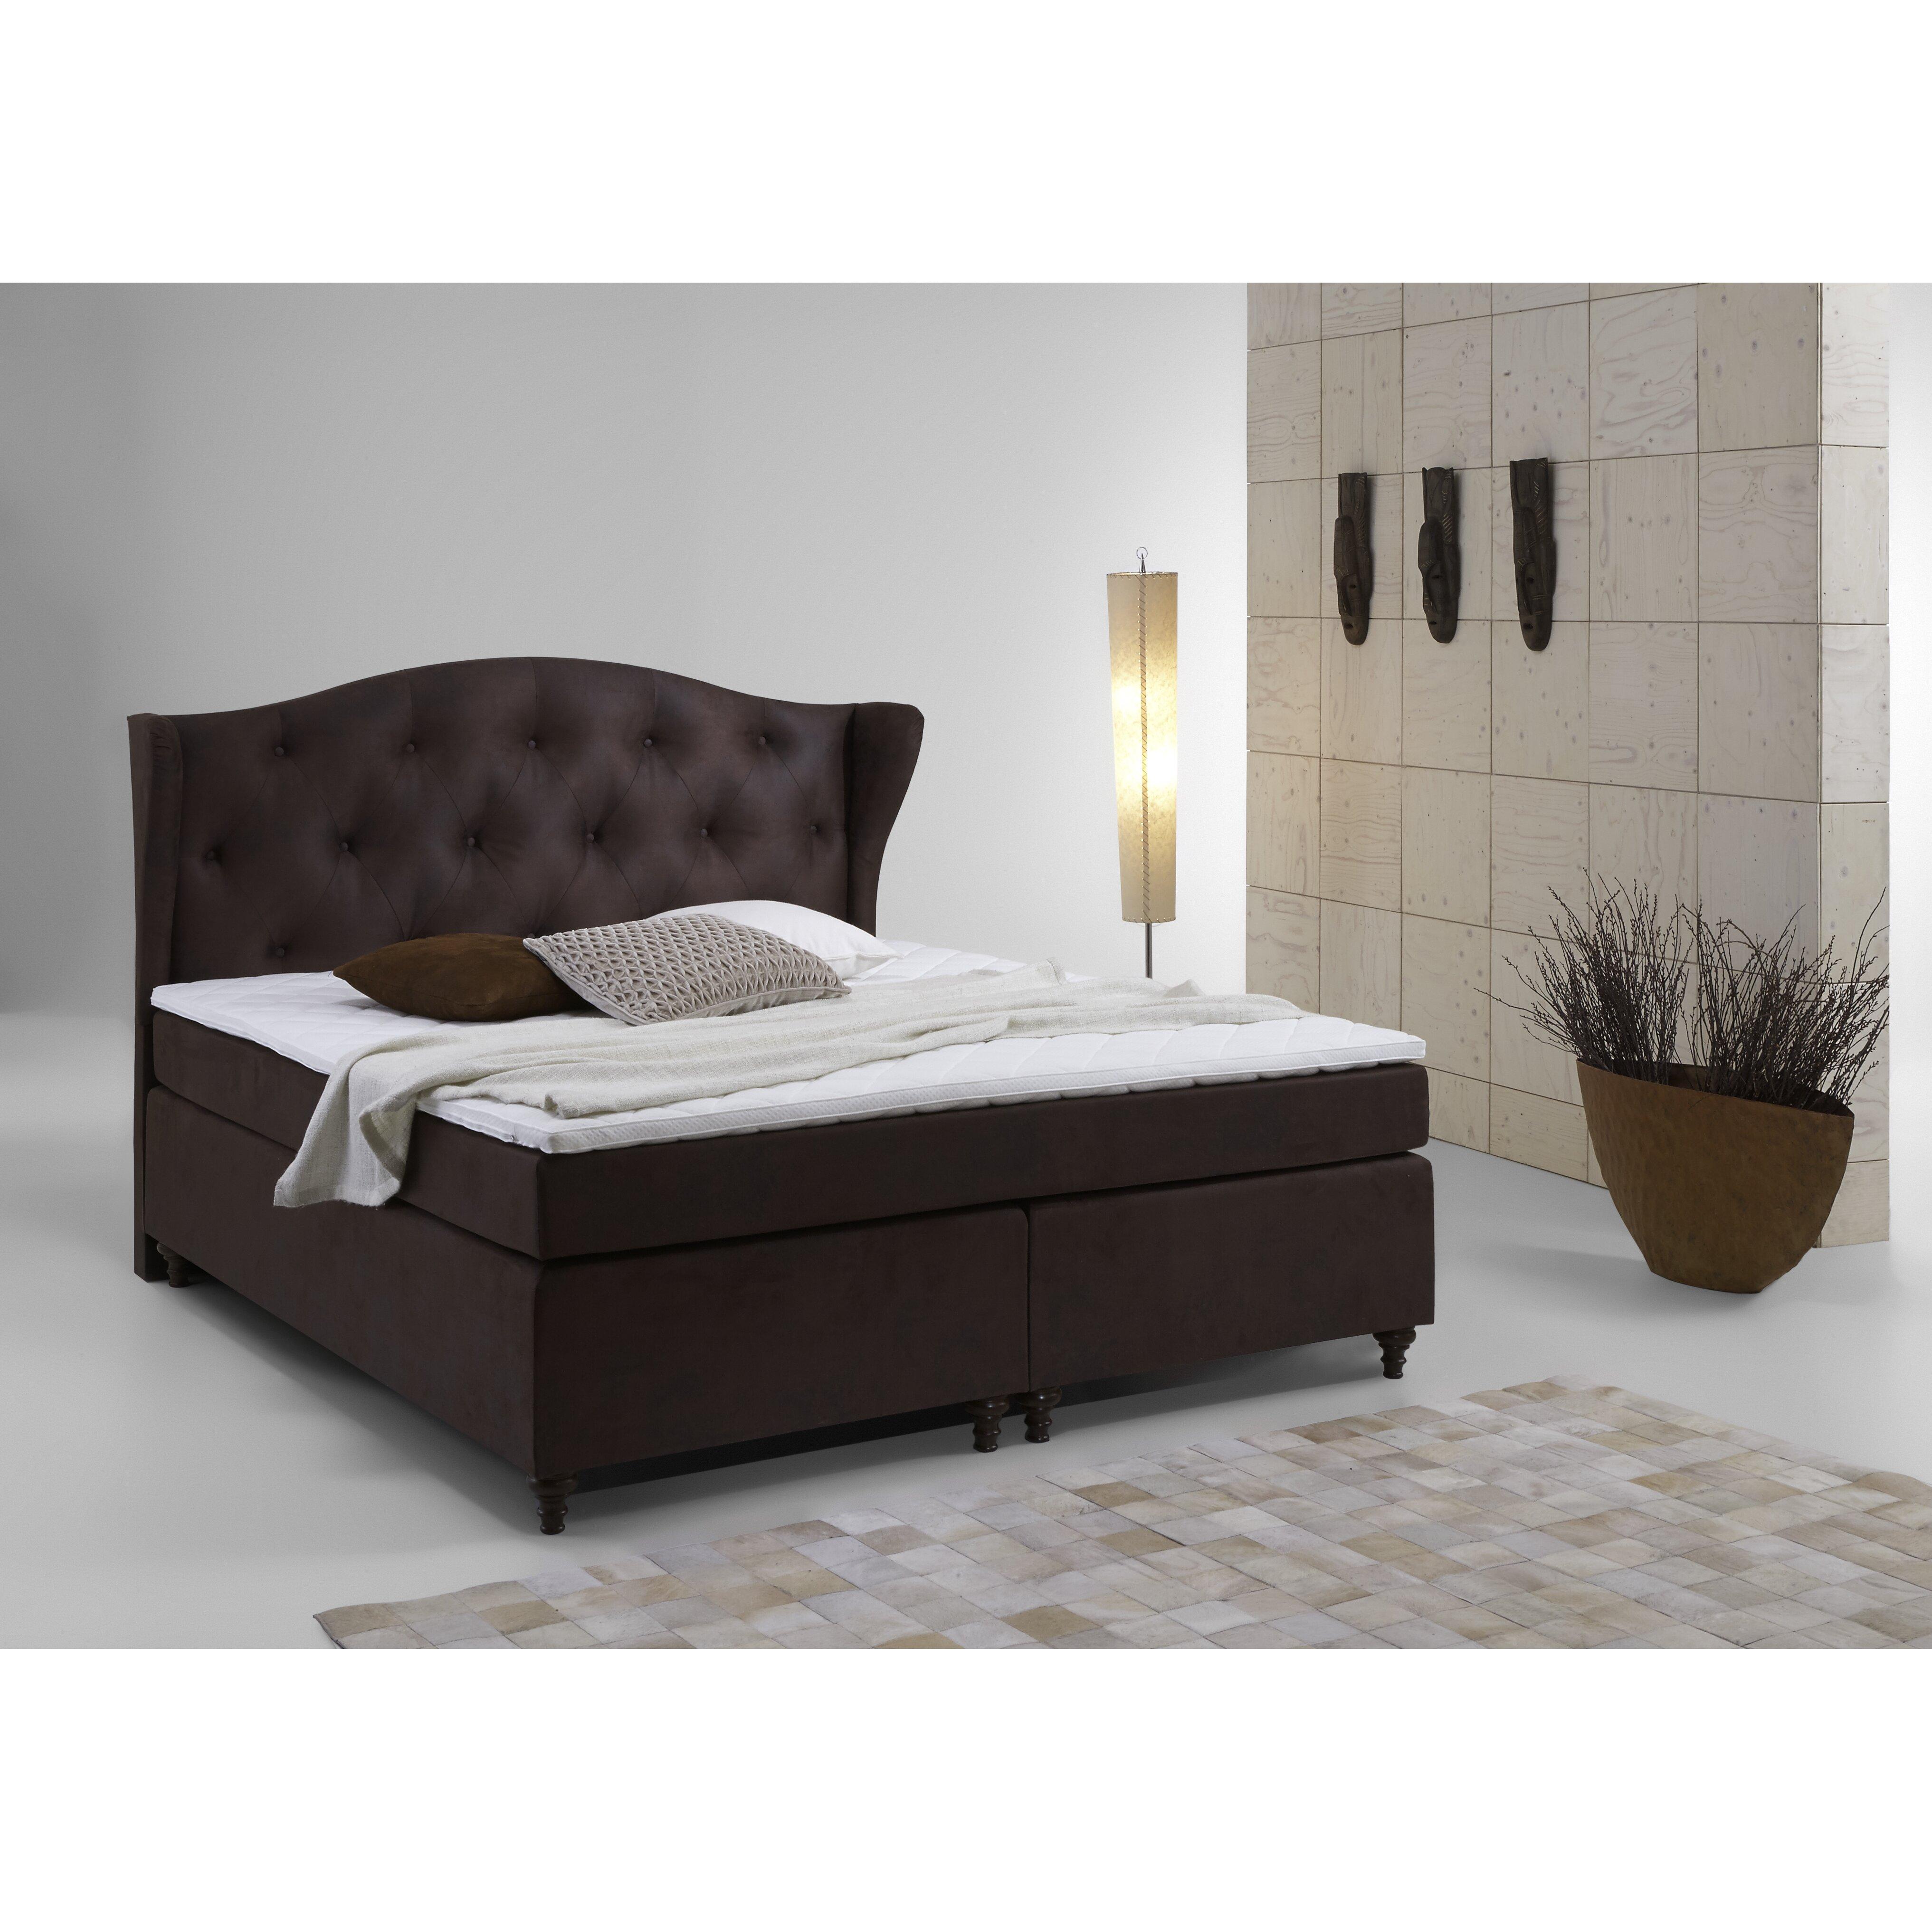 atlantic home collection boxspringbett felix mit topper. Black Bedroom Furniture Sets. Home Design Ideas